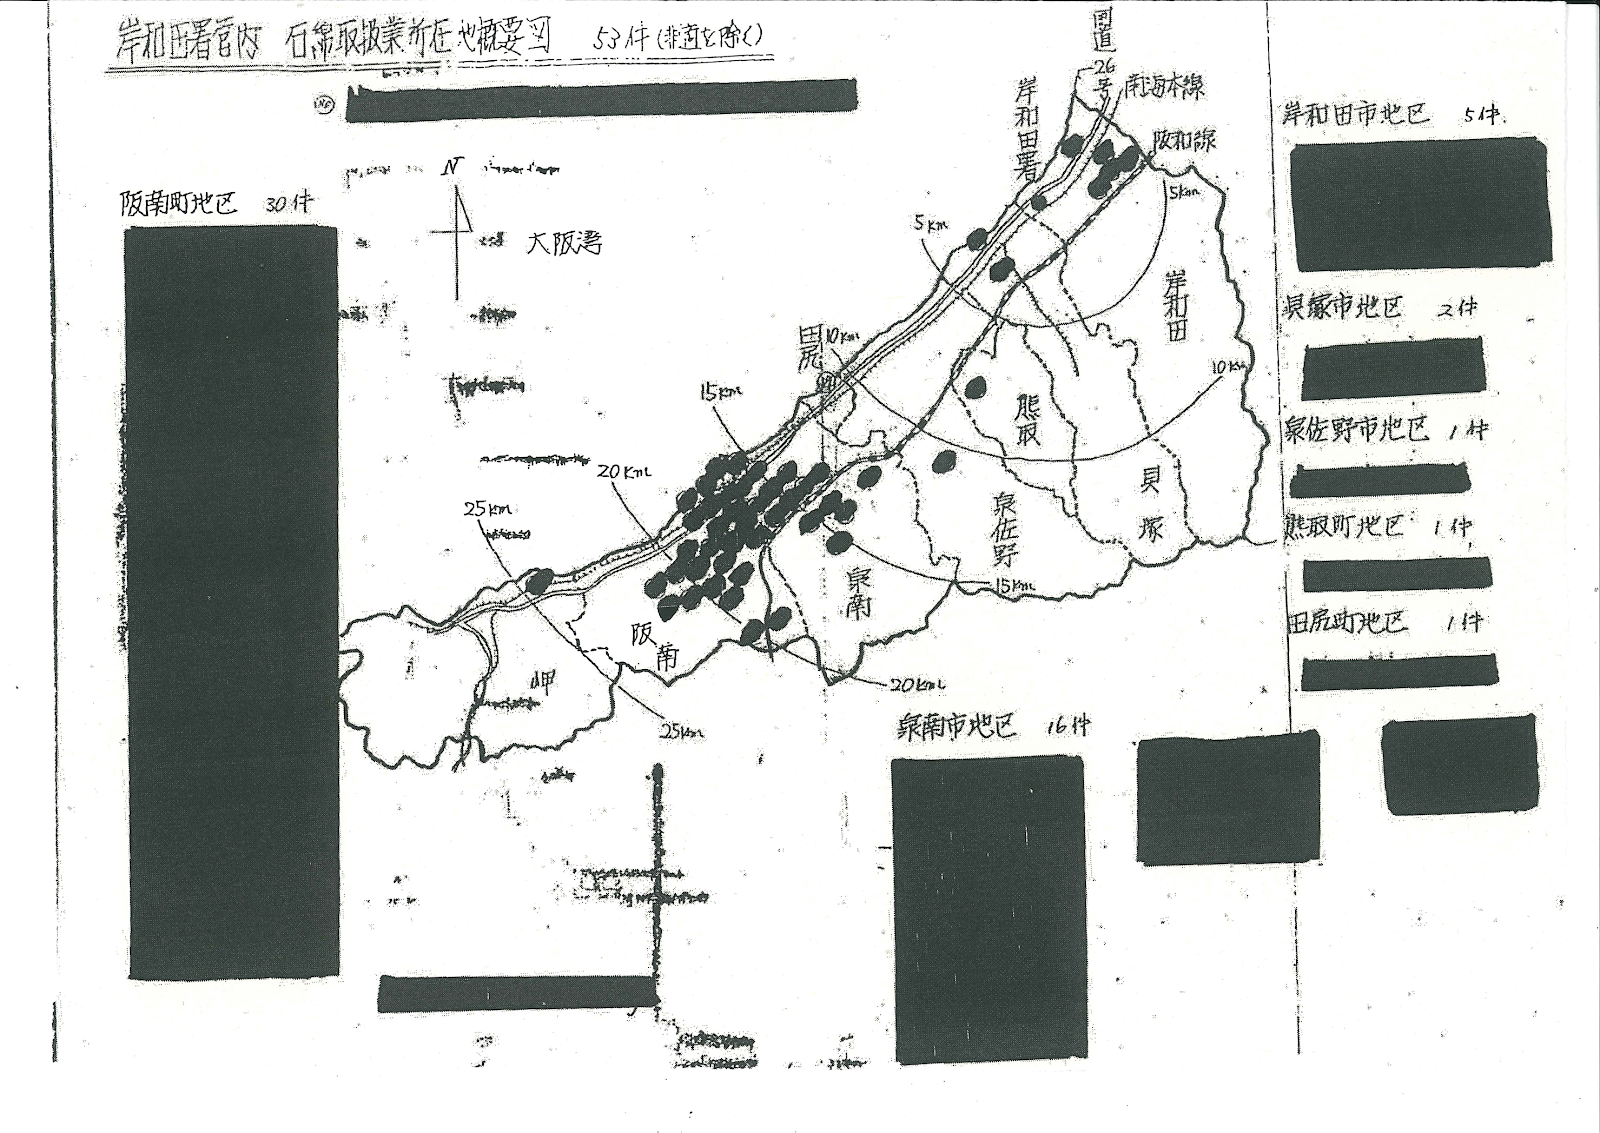 C:\Users\sawadyi\Desktop\scan\岸和田監督署内石綿取扱業所在地概要図.jpg